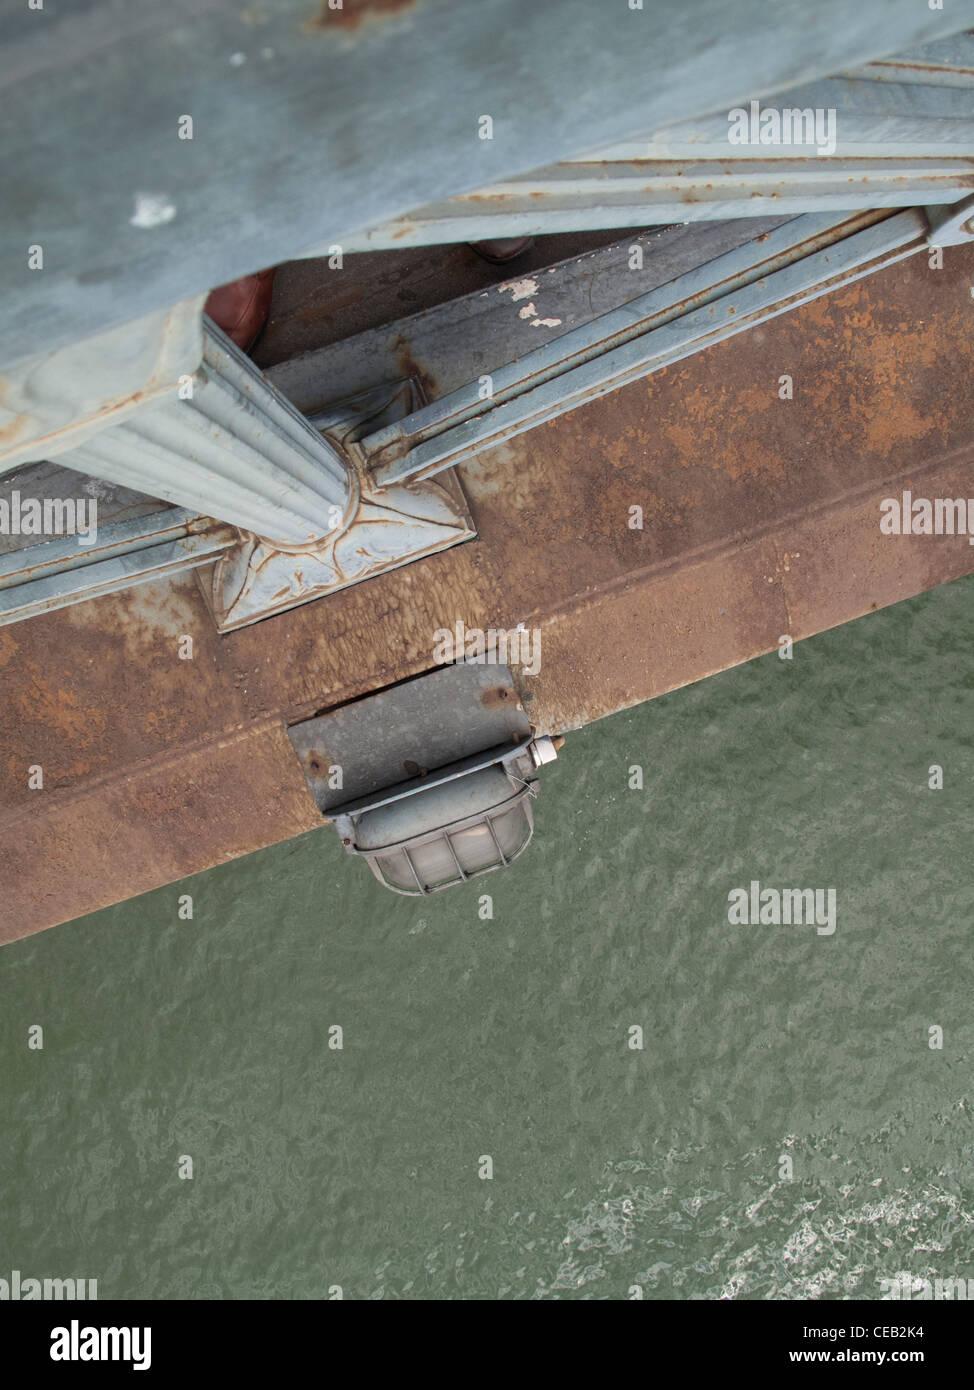 Danube river from the Chain Bridge, Budapest - Stock Image